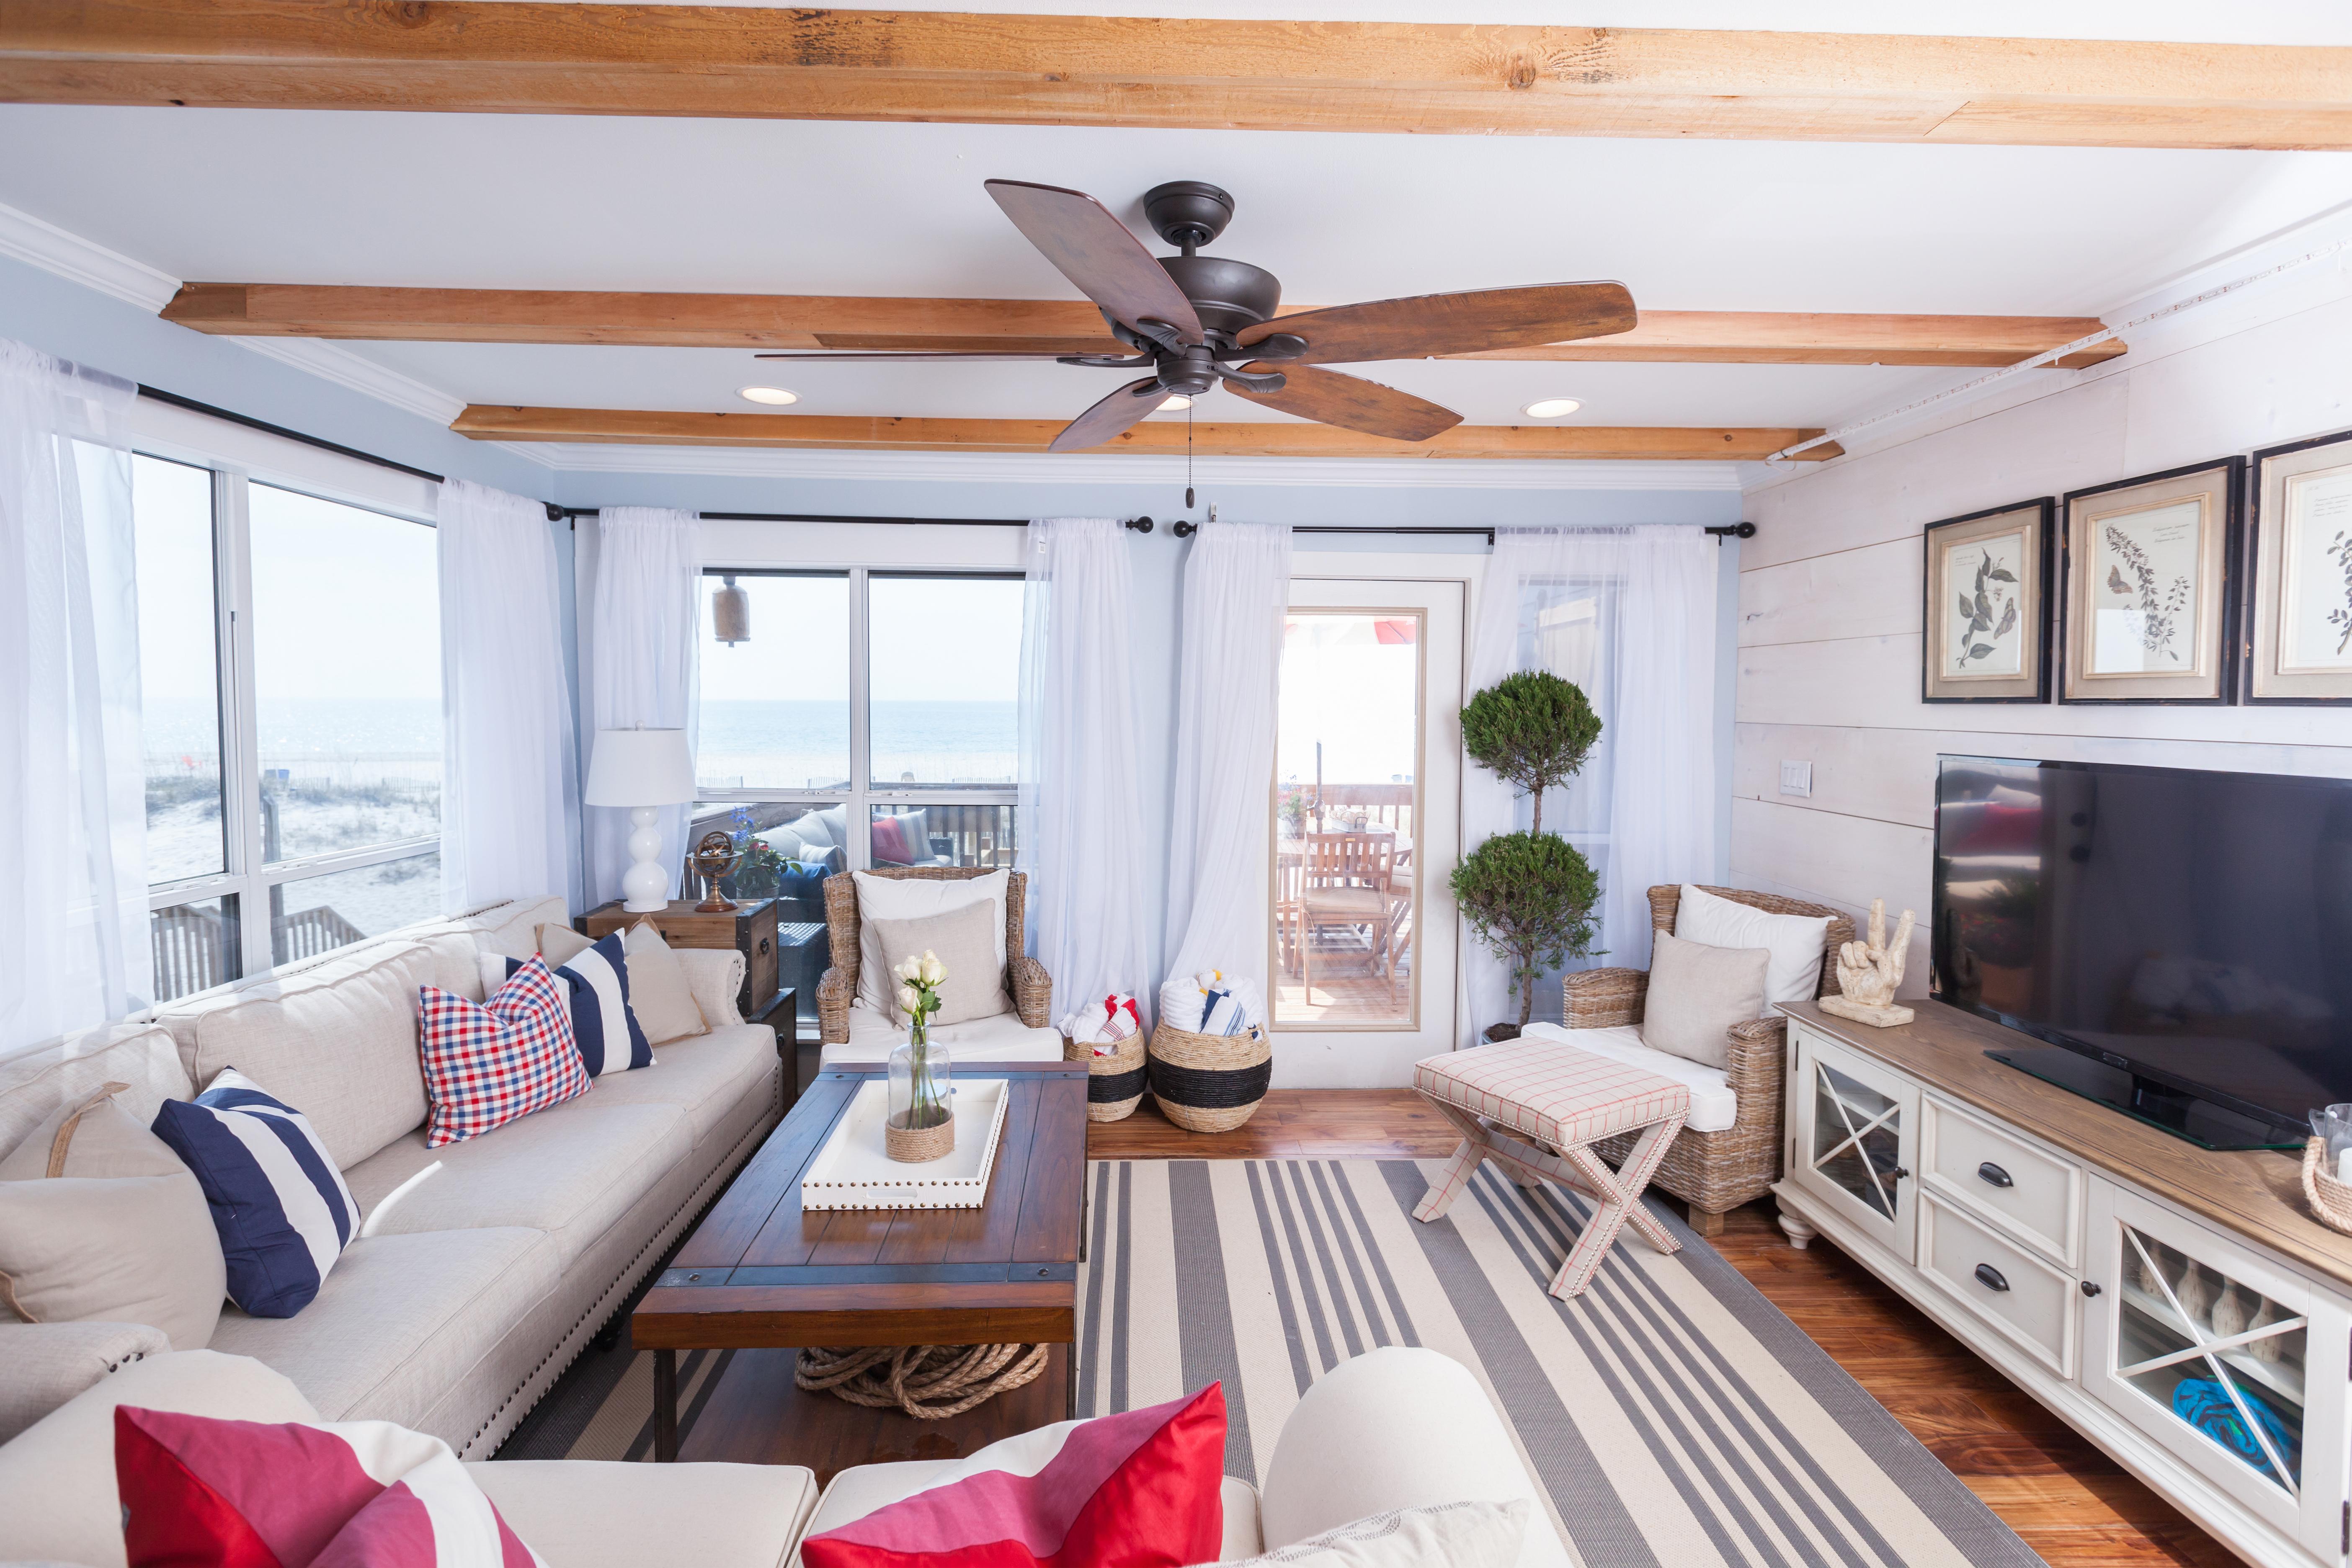 6 Beach House Living Room Decorating Ideas   HGTV Design ...